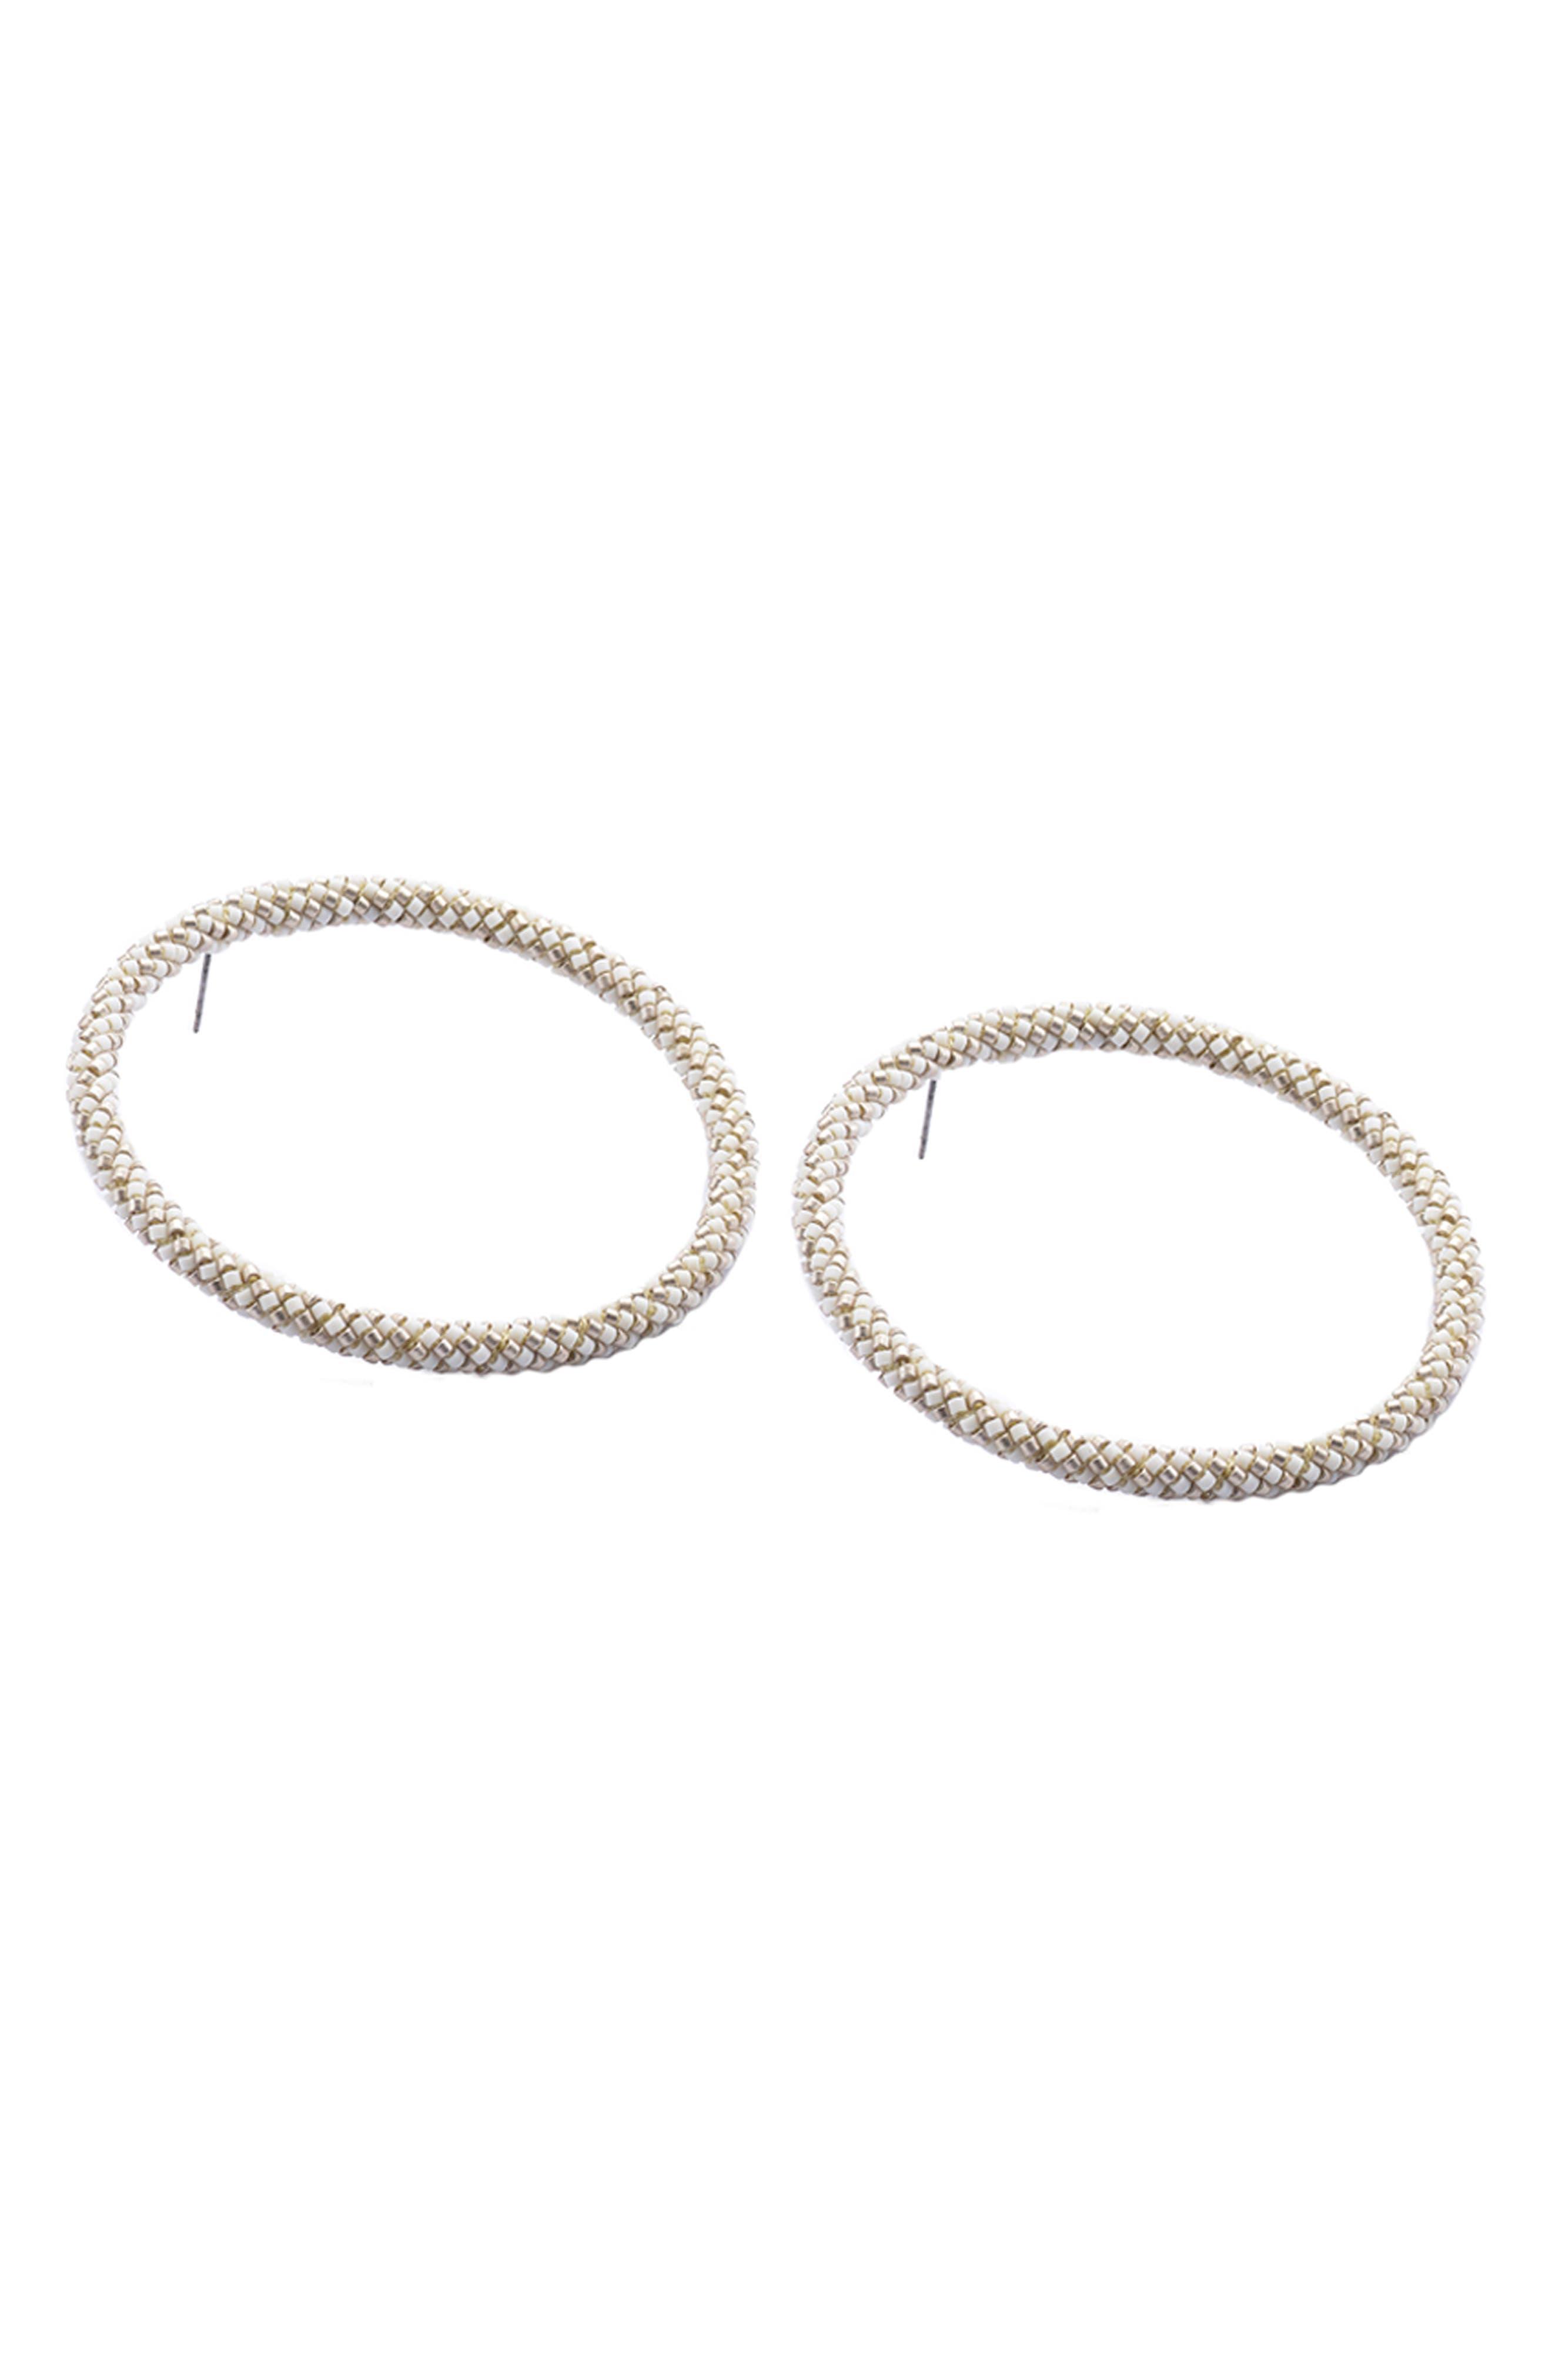 MISHKY Hula Hula XL Hoop Earrings, Main, color, WHITE